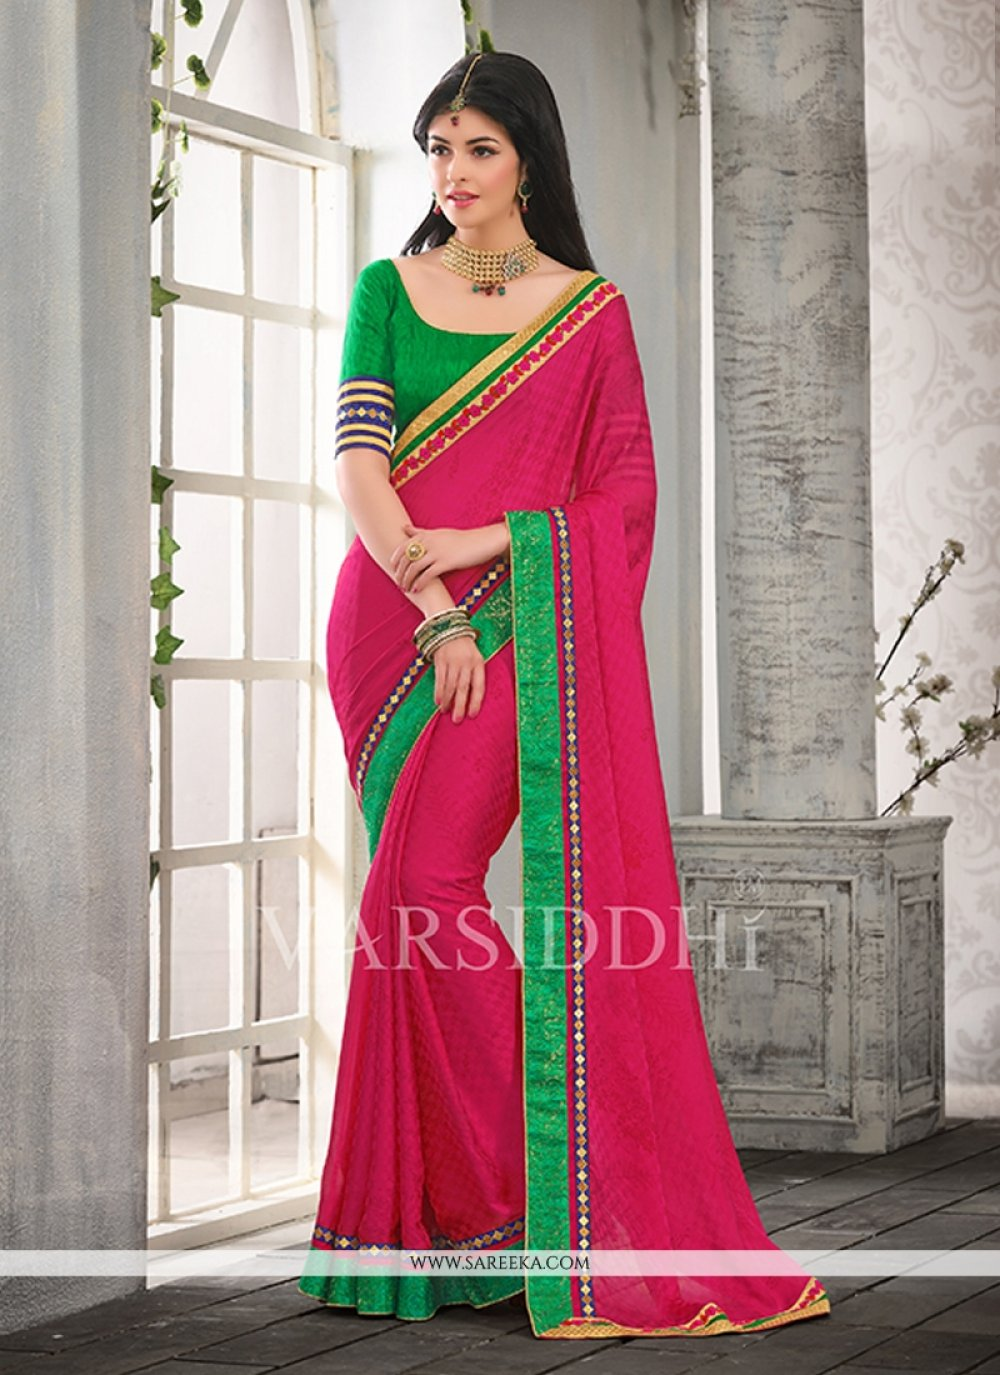 Hot Pink Satin Chiffon Casual Saree